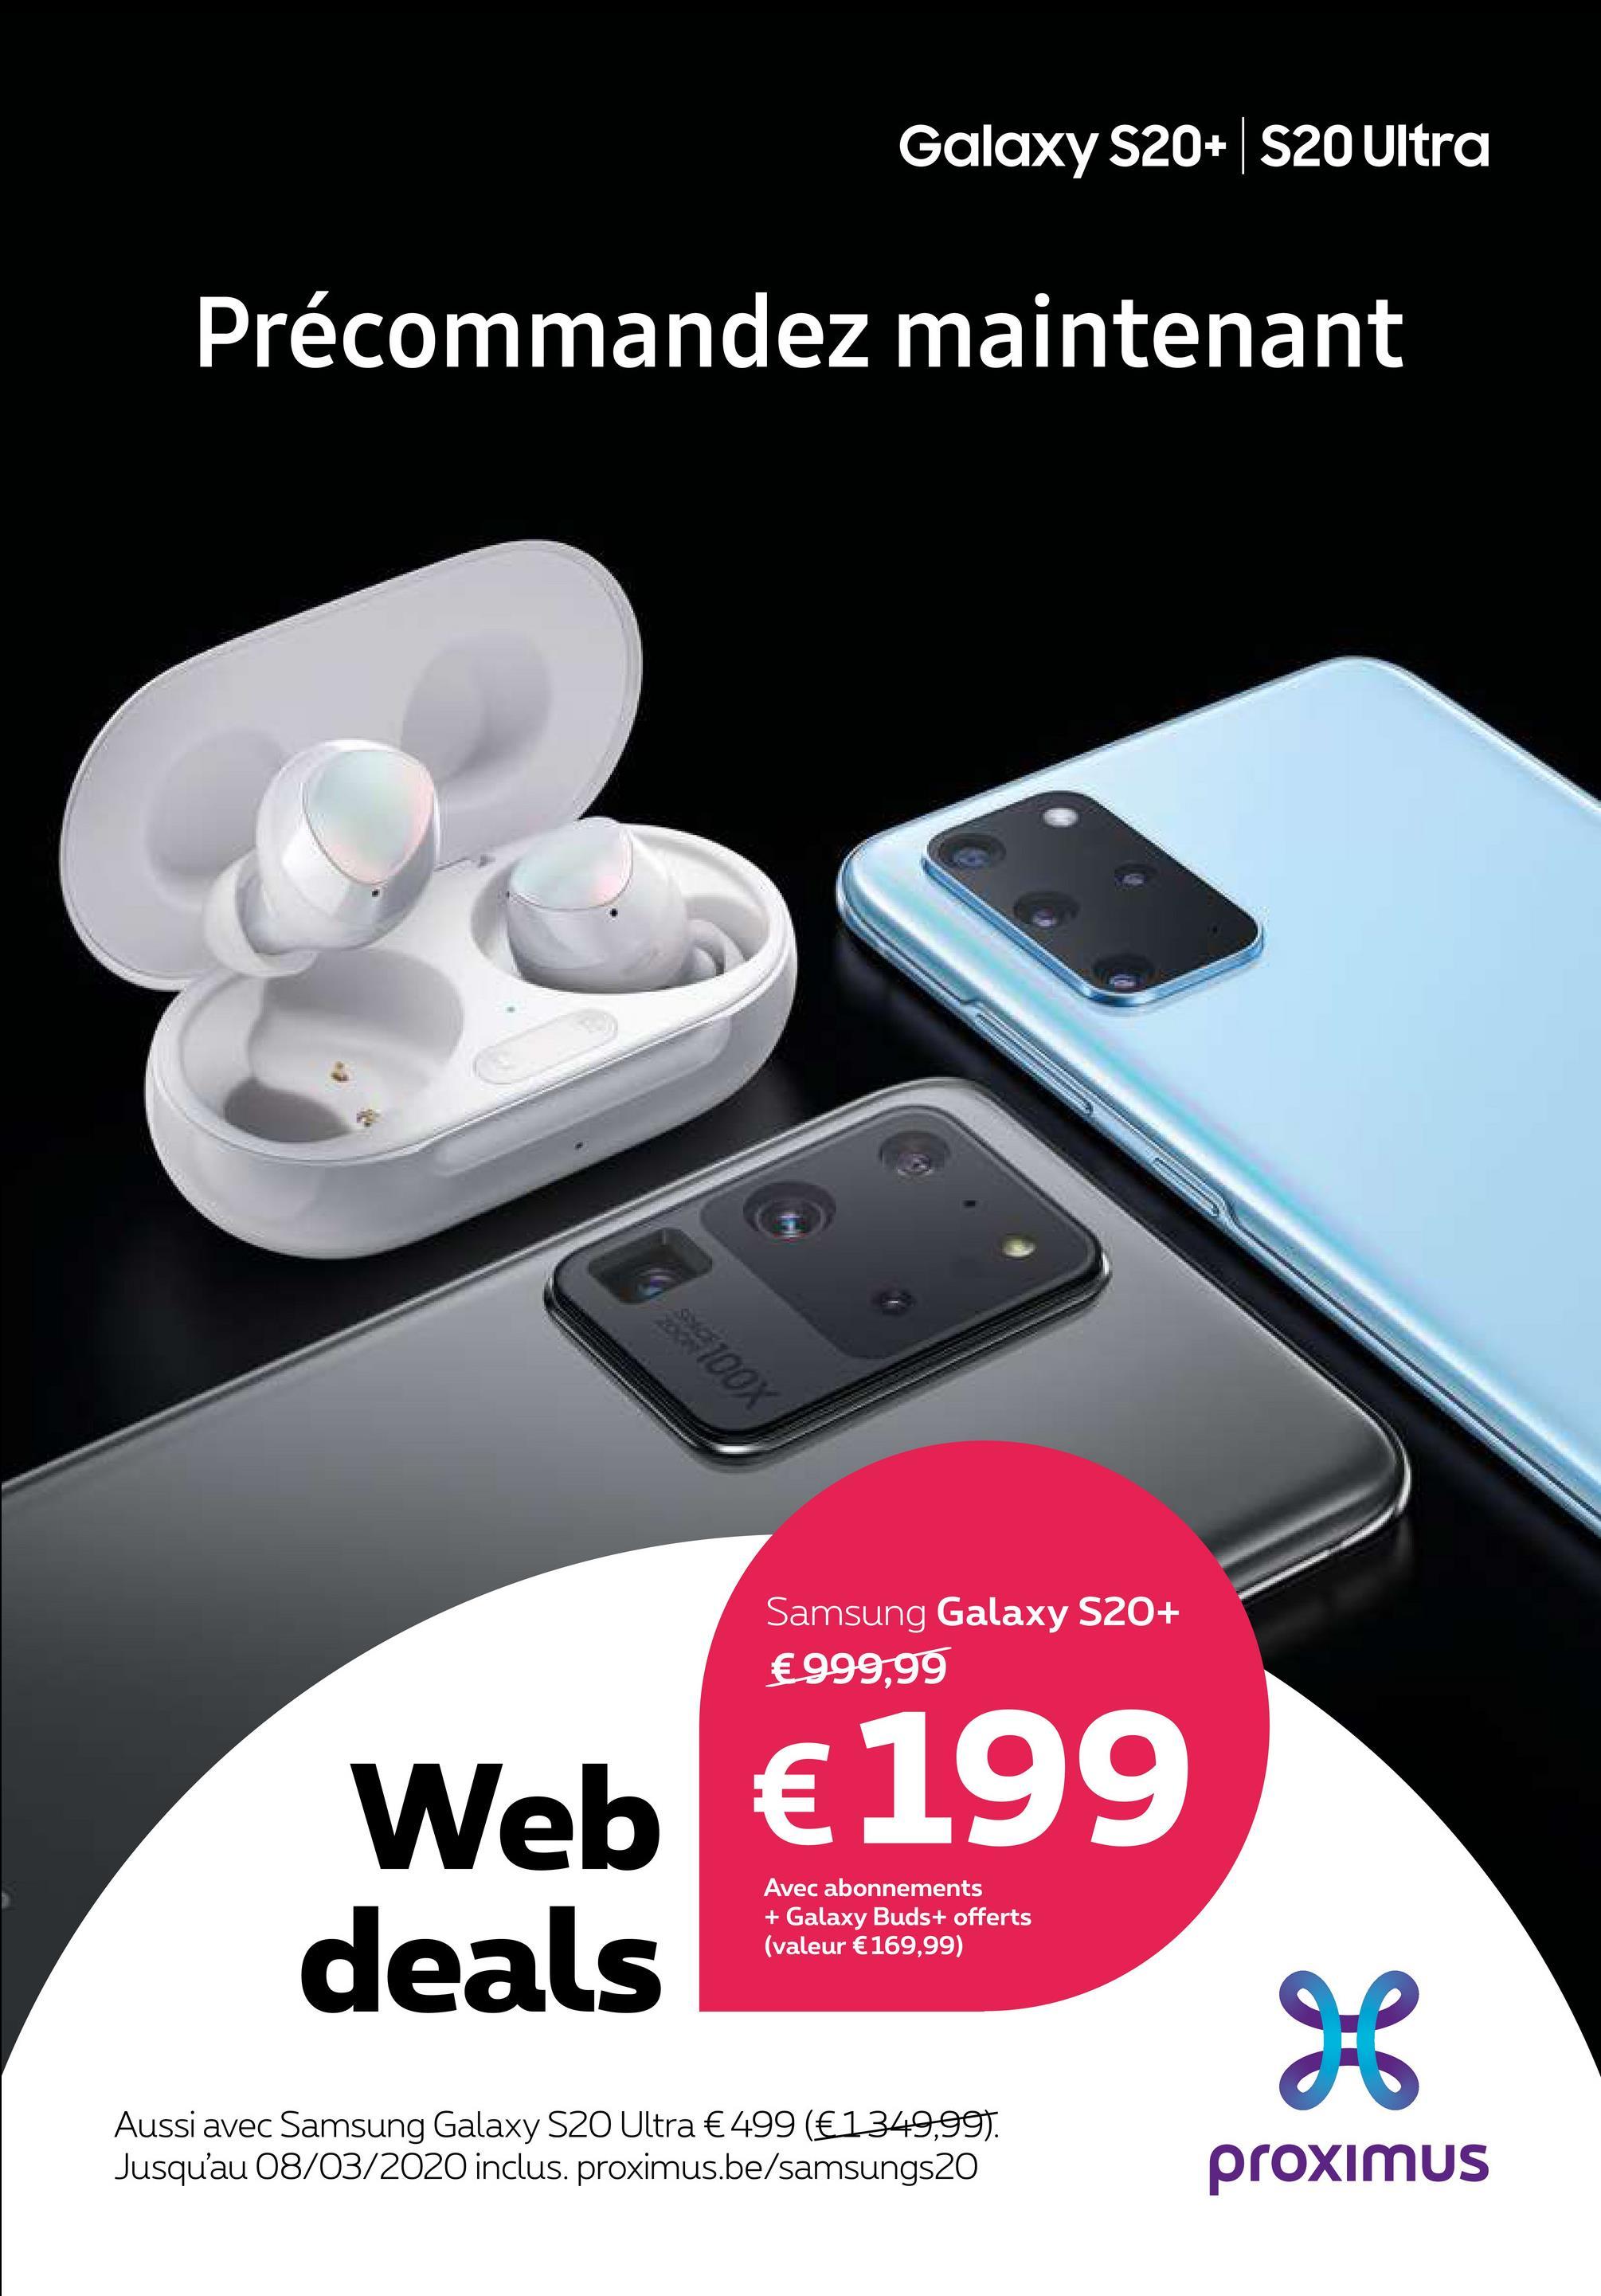 Galaxy S20+ S20 Ultra Précommandez maintenant ng 100% Samsung Galaxy S20+ €999,99 Web € 199 Avec abonnements + Galaxy Buds+ offerts (valeur € 169,99) deals Aussi avec Samsung Galaxy S20 Ultra € 499 (€1349,99). Jusqu'au 08/03/2020 inclus. proximus.be/samsungs20 proximus